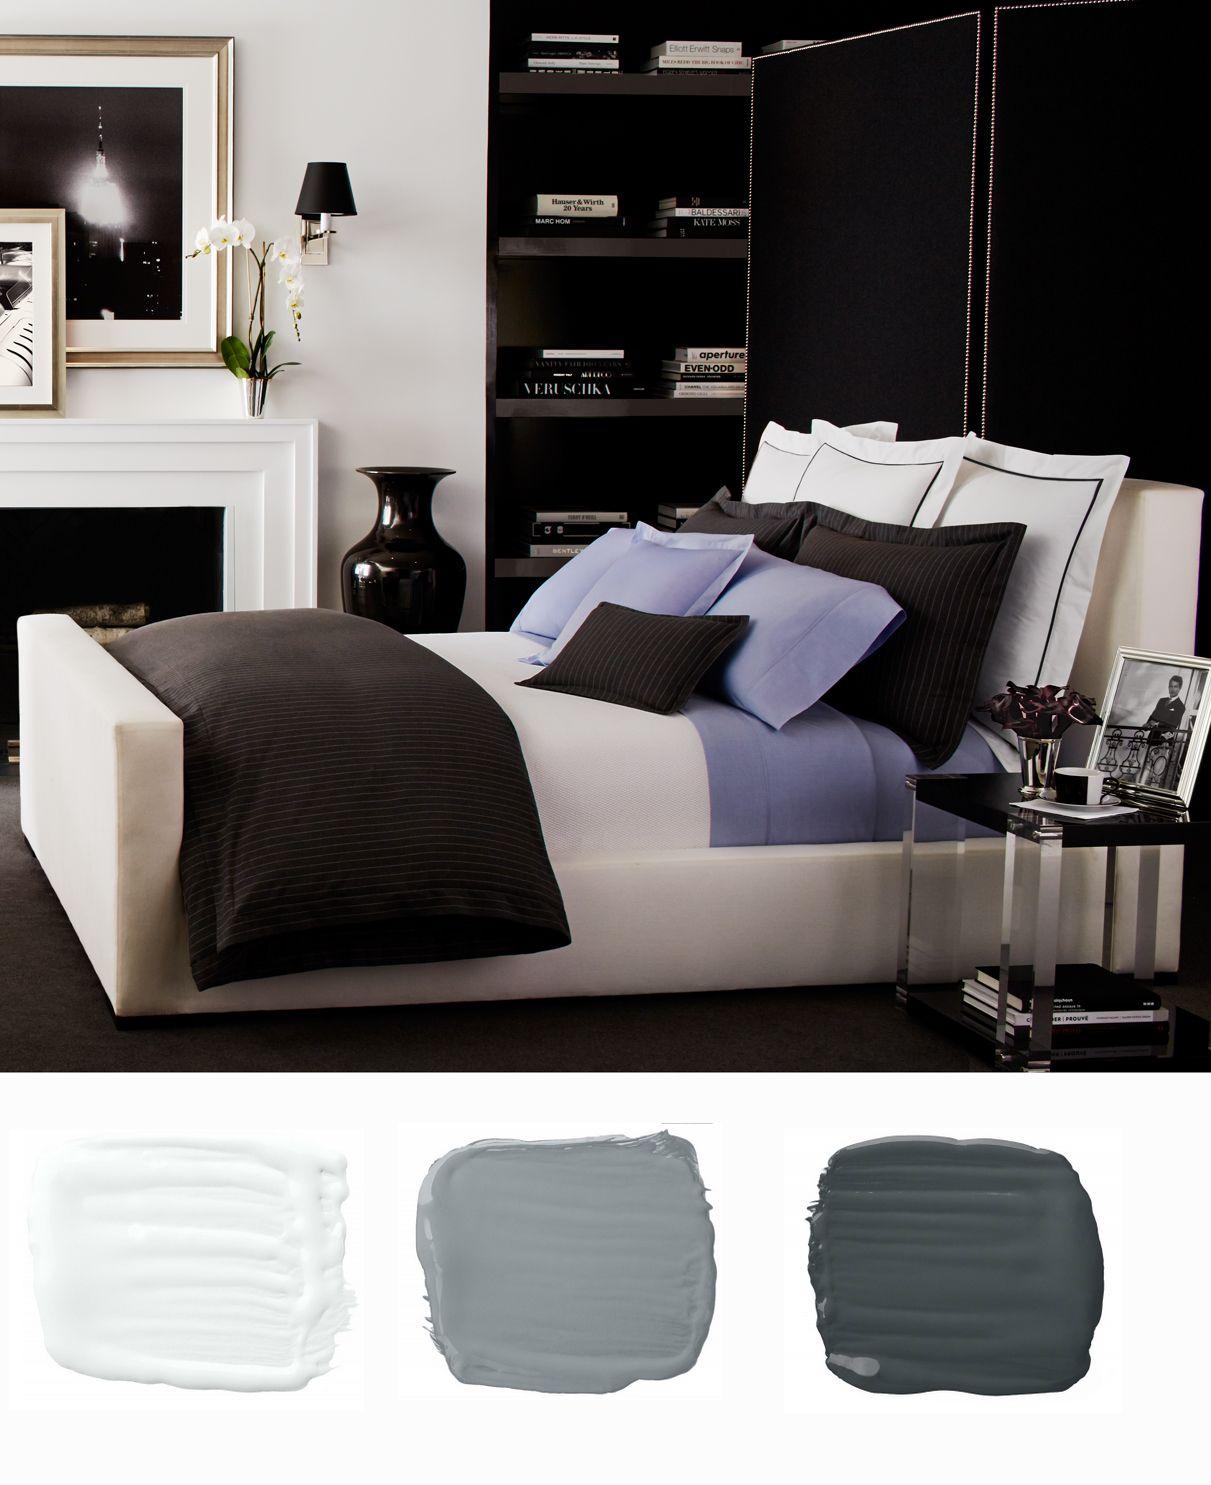 RL bedroom makeover: Gray Haberdashery menswear-inspired bedding ...